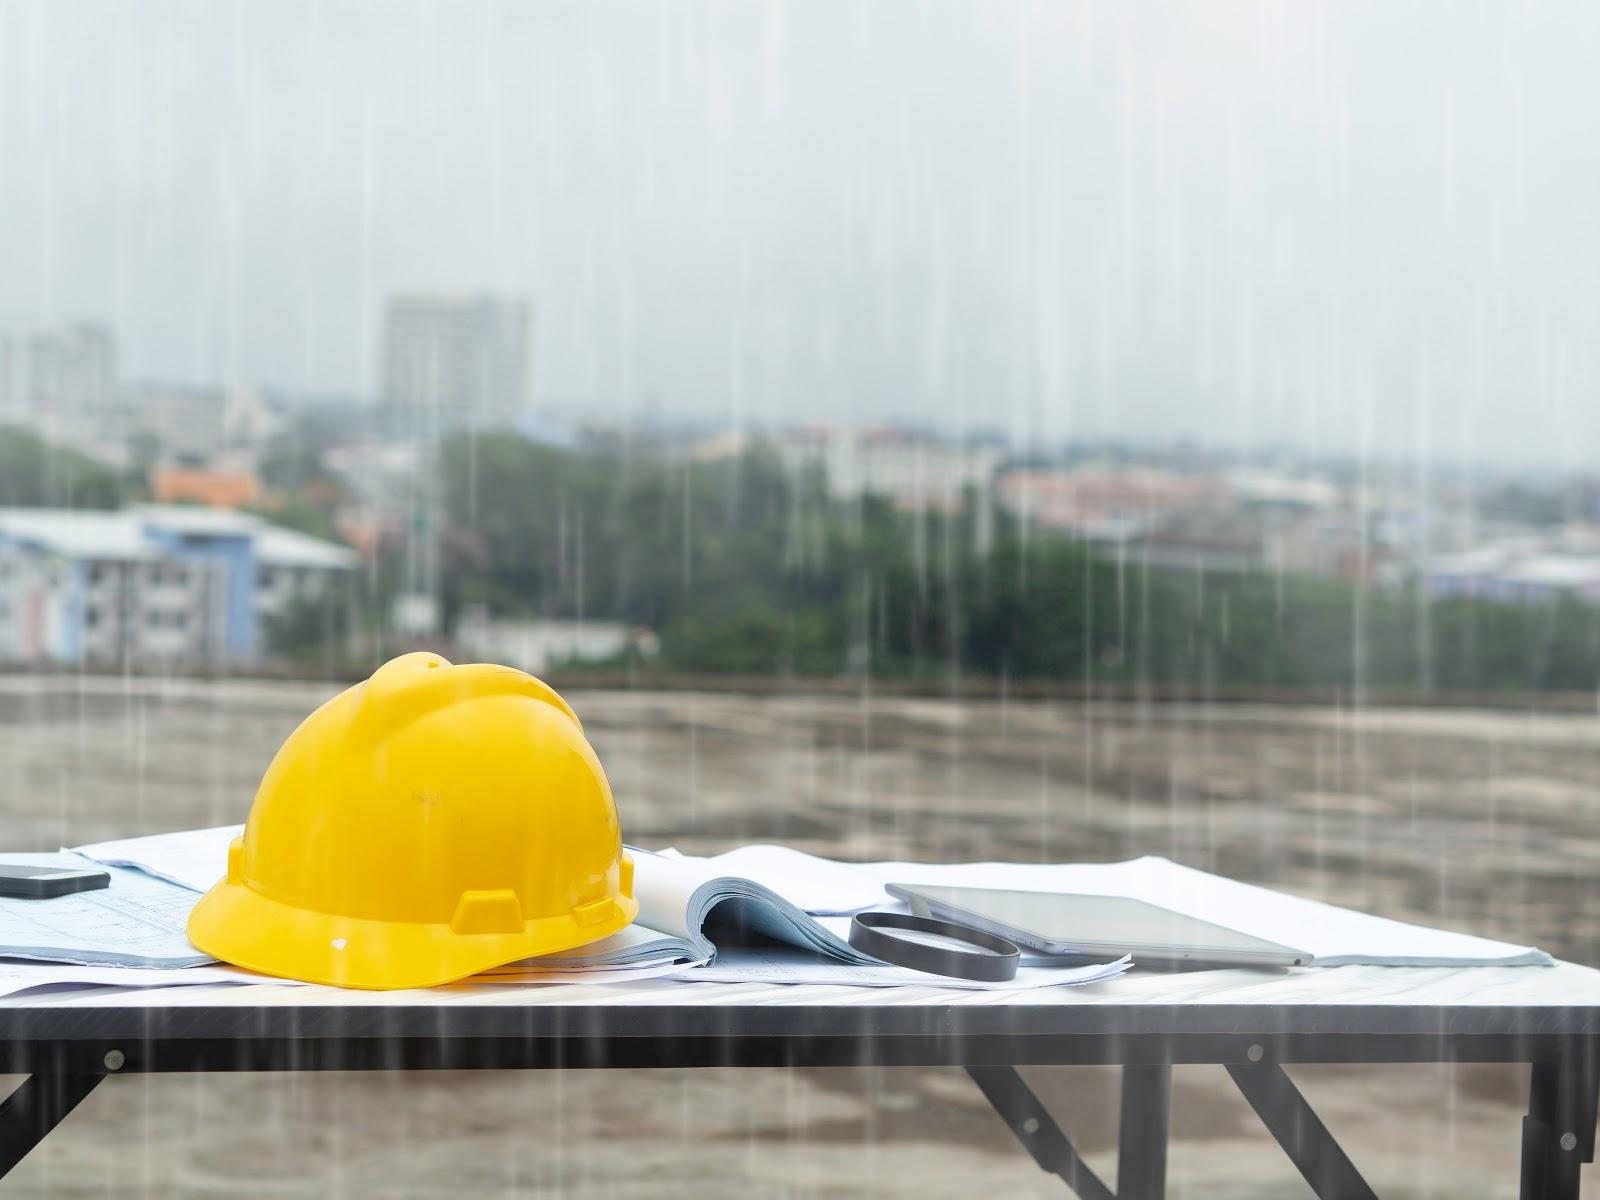 raining wet weather construction diy